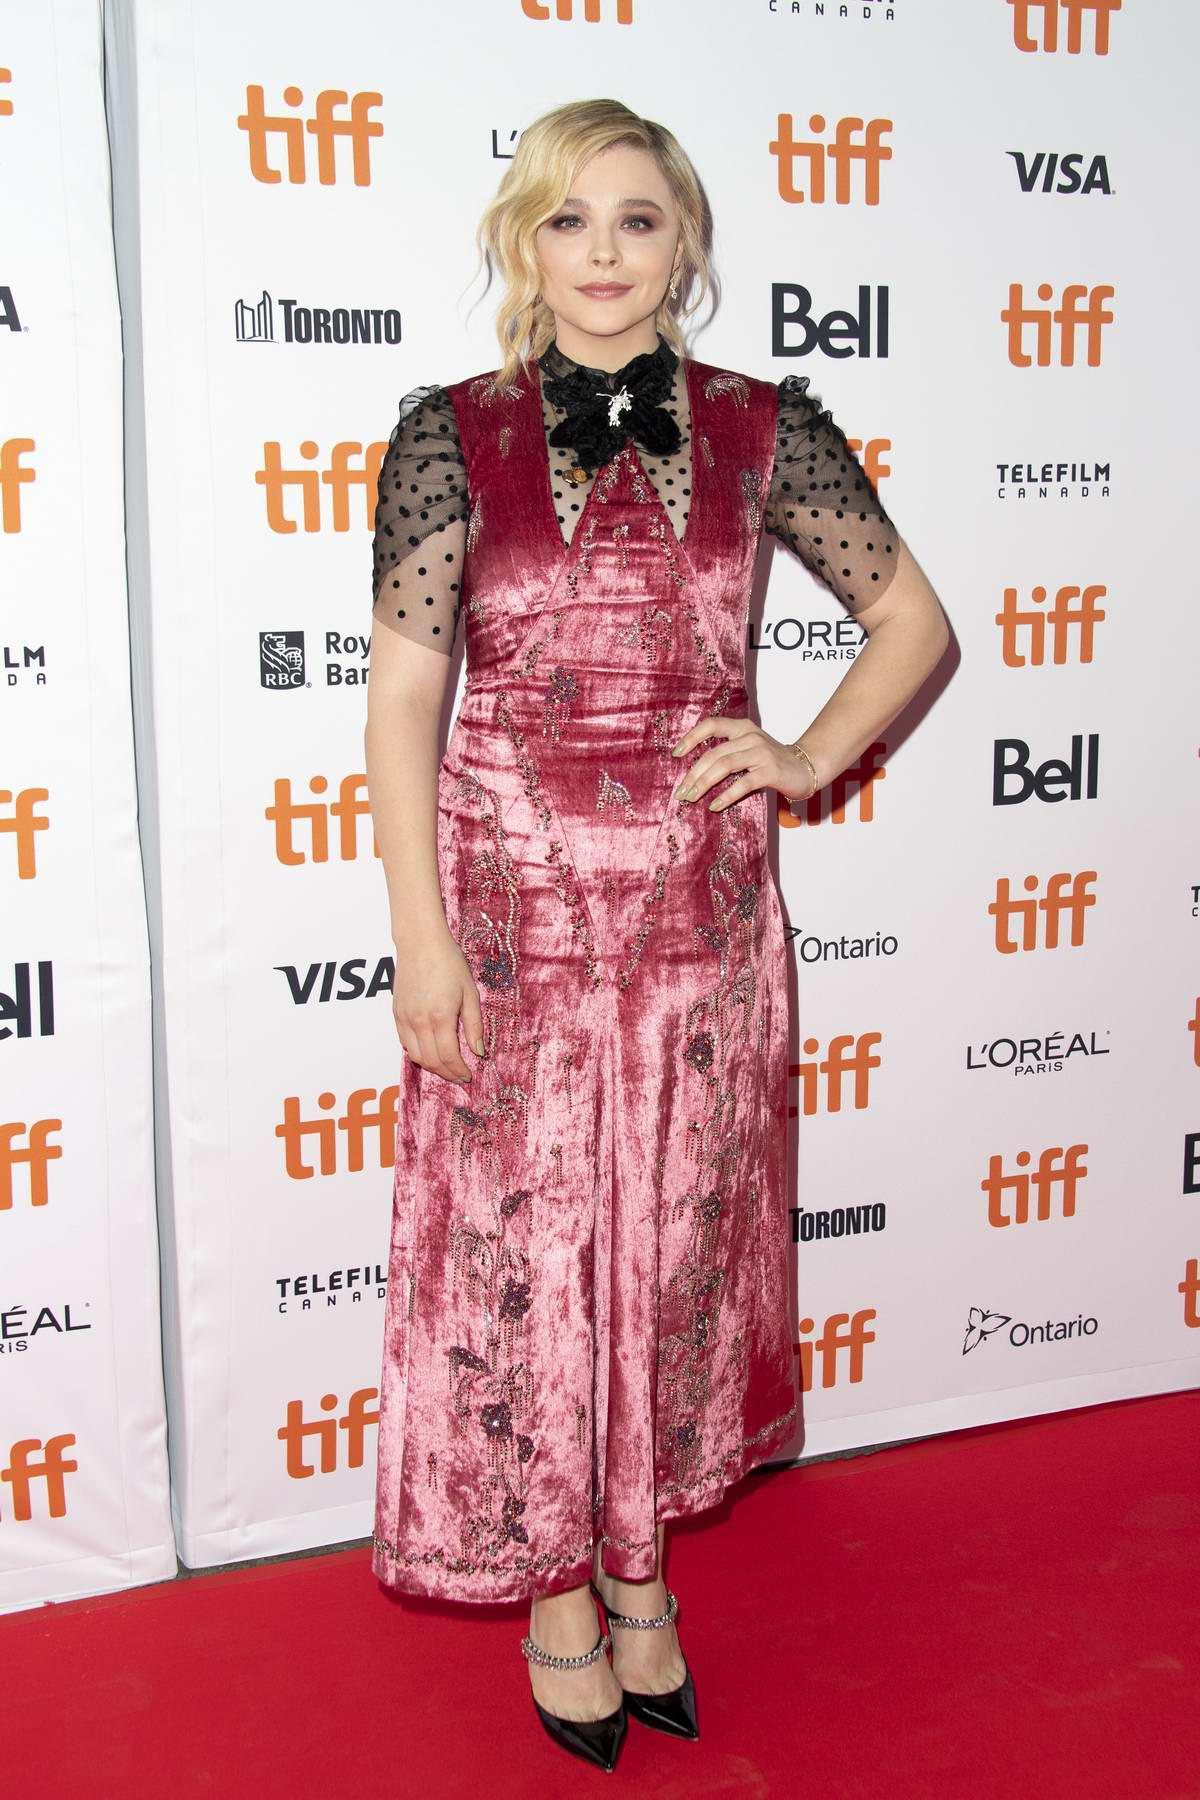 Chloe Grace Moretz attends 'Greta' premiere during the Toronto International Film Festival (TIFF 2018) in Toronto, Canada